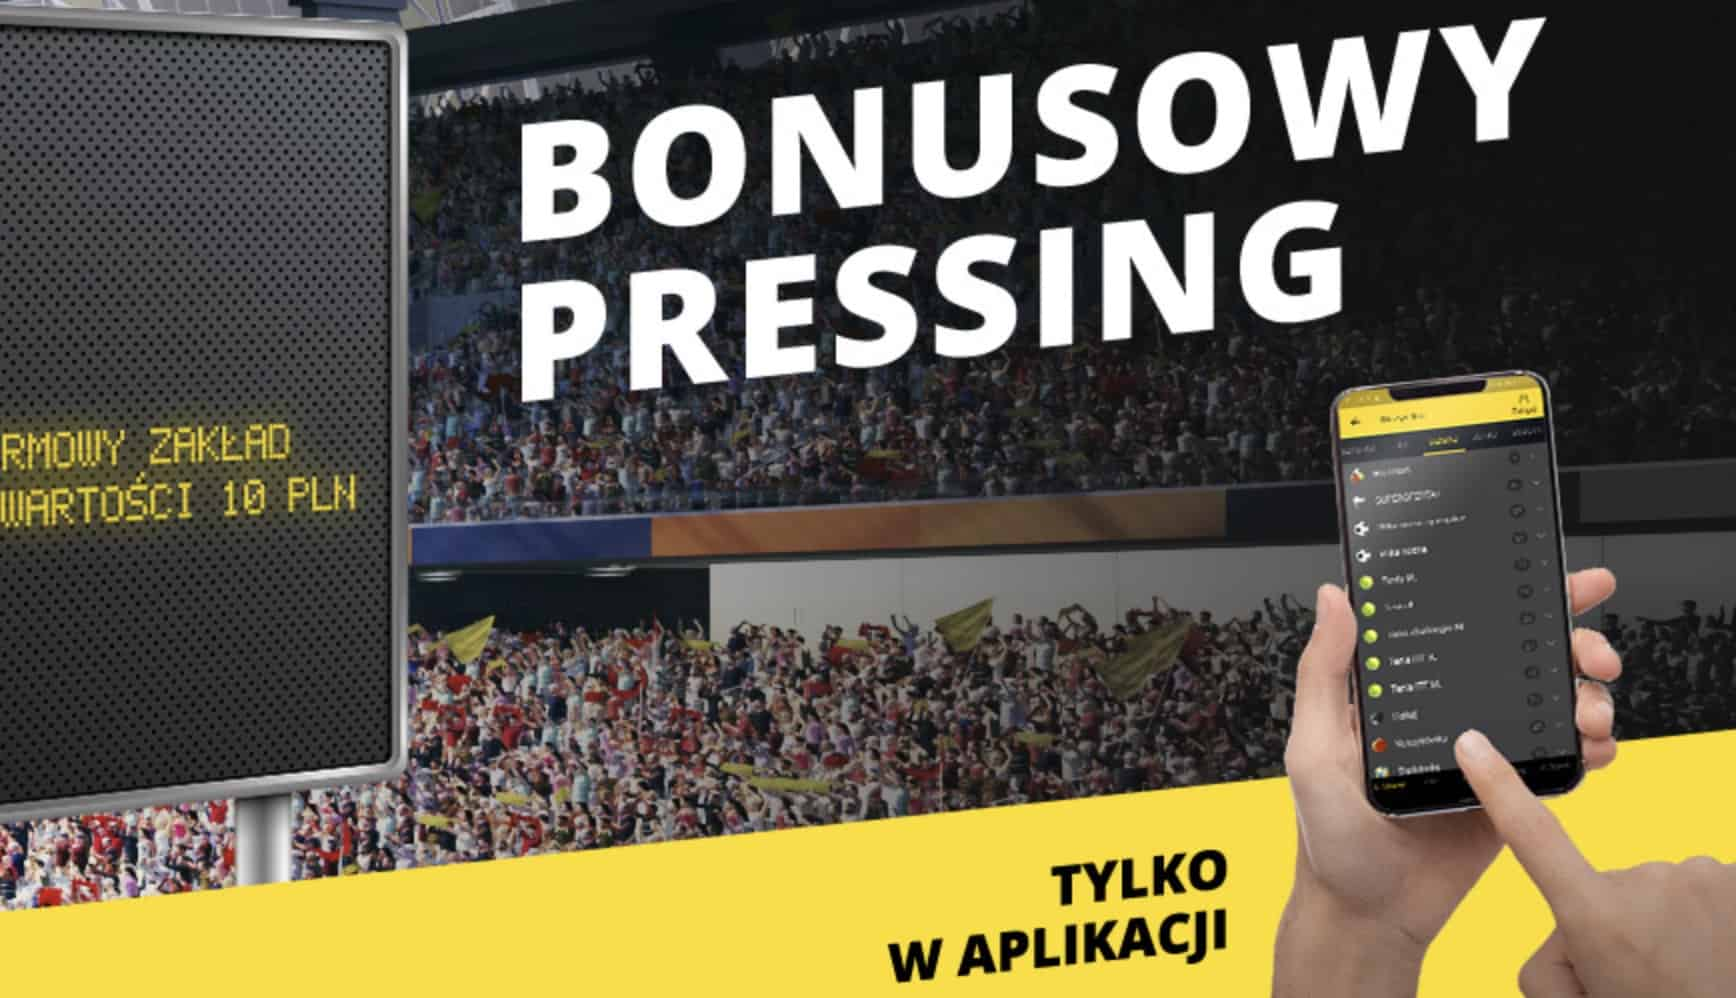 10 PLN na ostatnią kolejkę Ekstraklasy. Bonus od Fortuny!